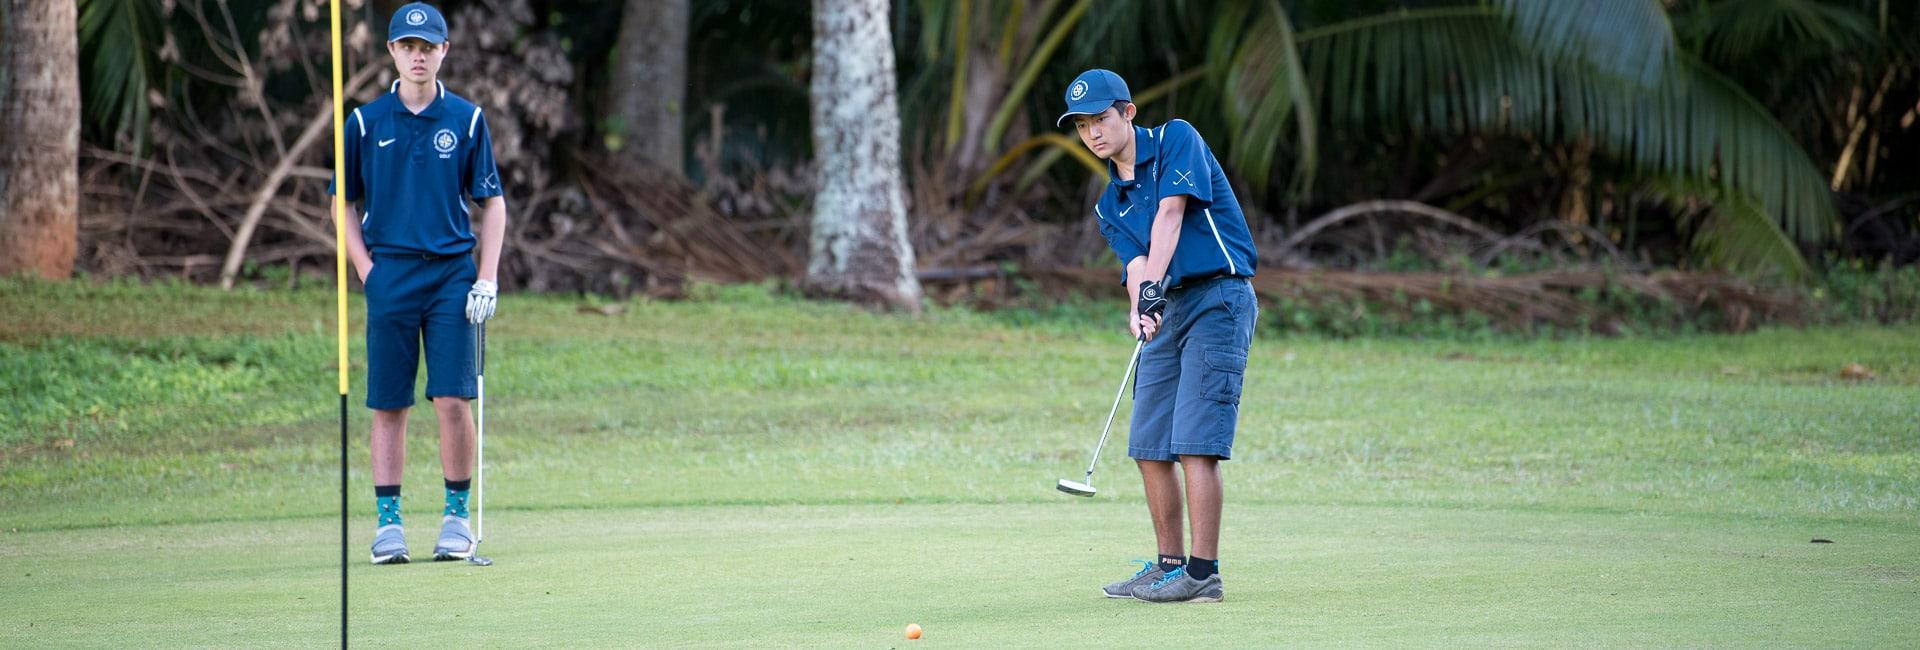 Intermediate boy golfer putting